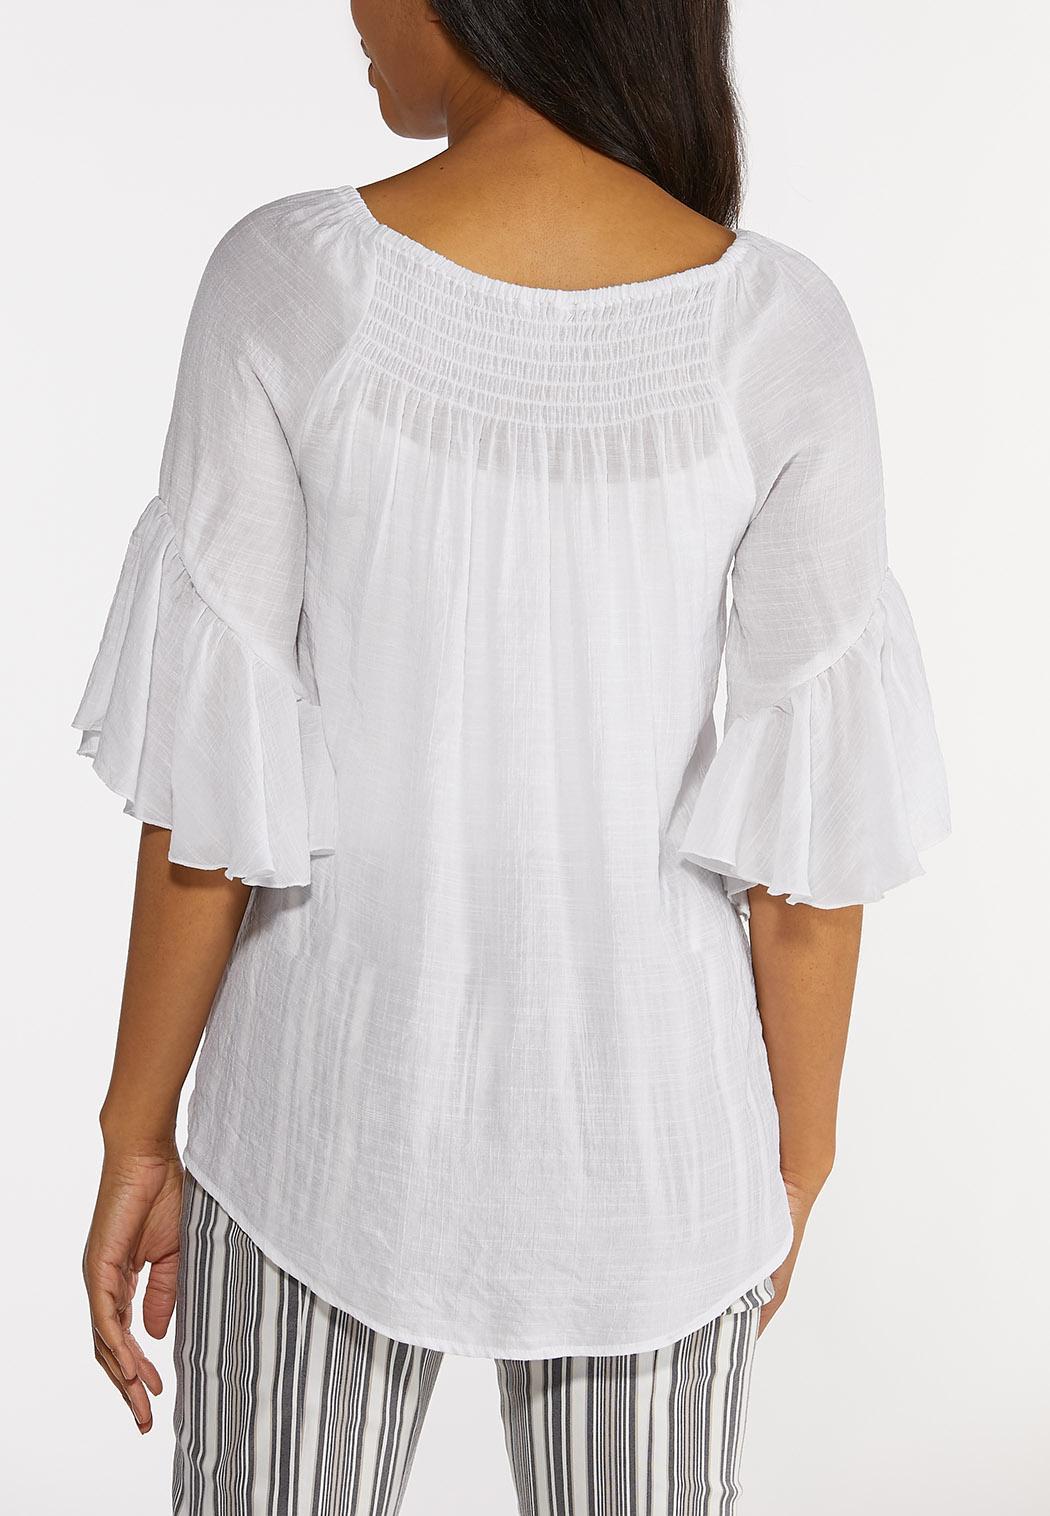 Plus Size White Ruffled Sleeve Top (Item #44240911)